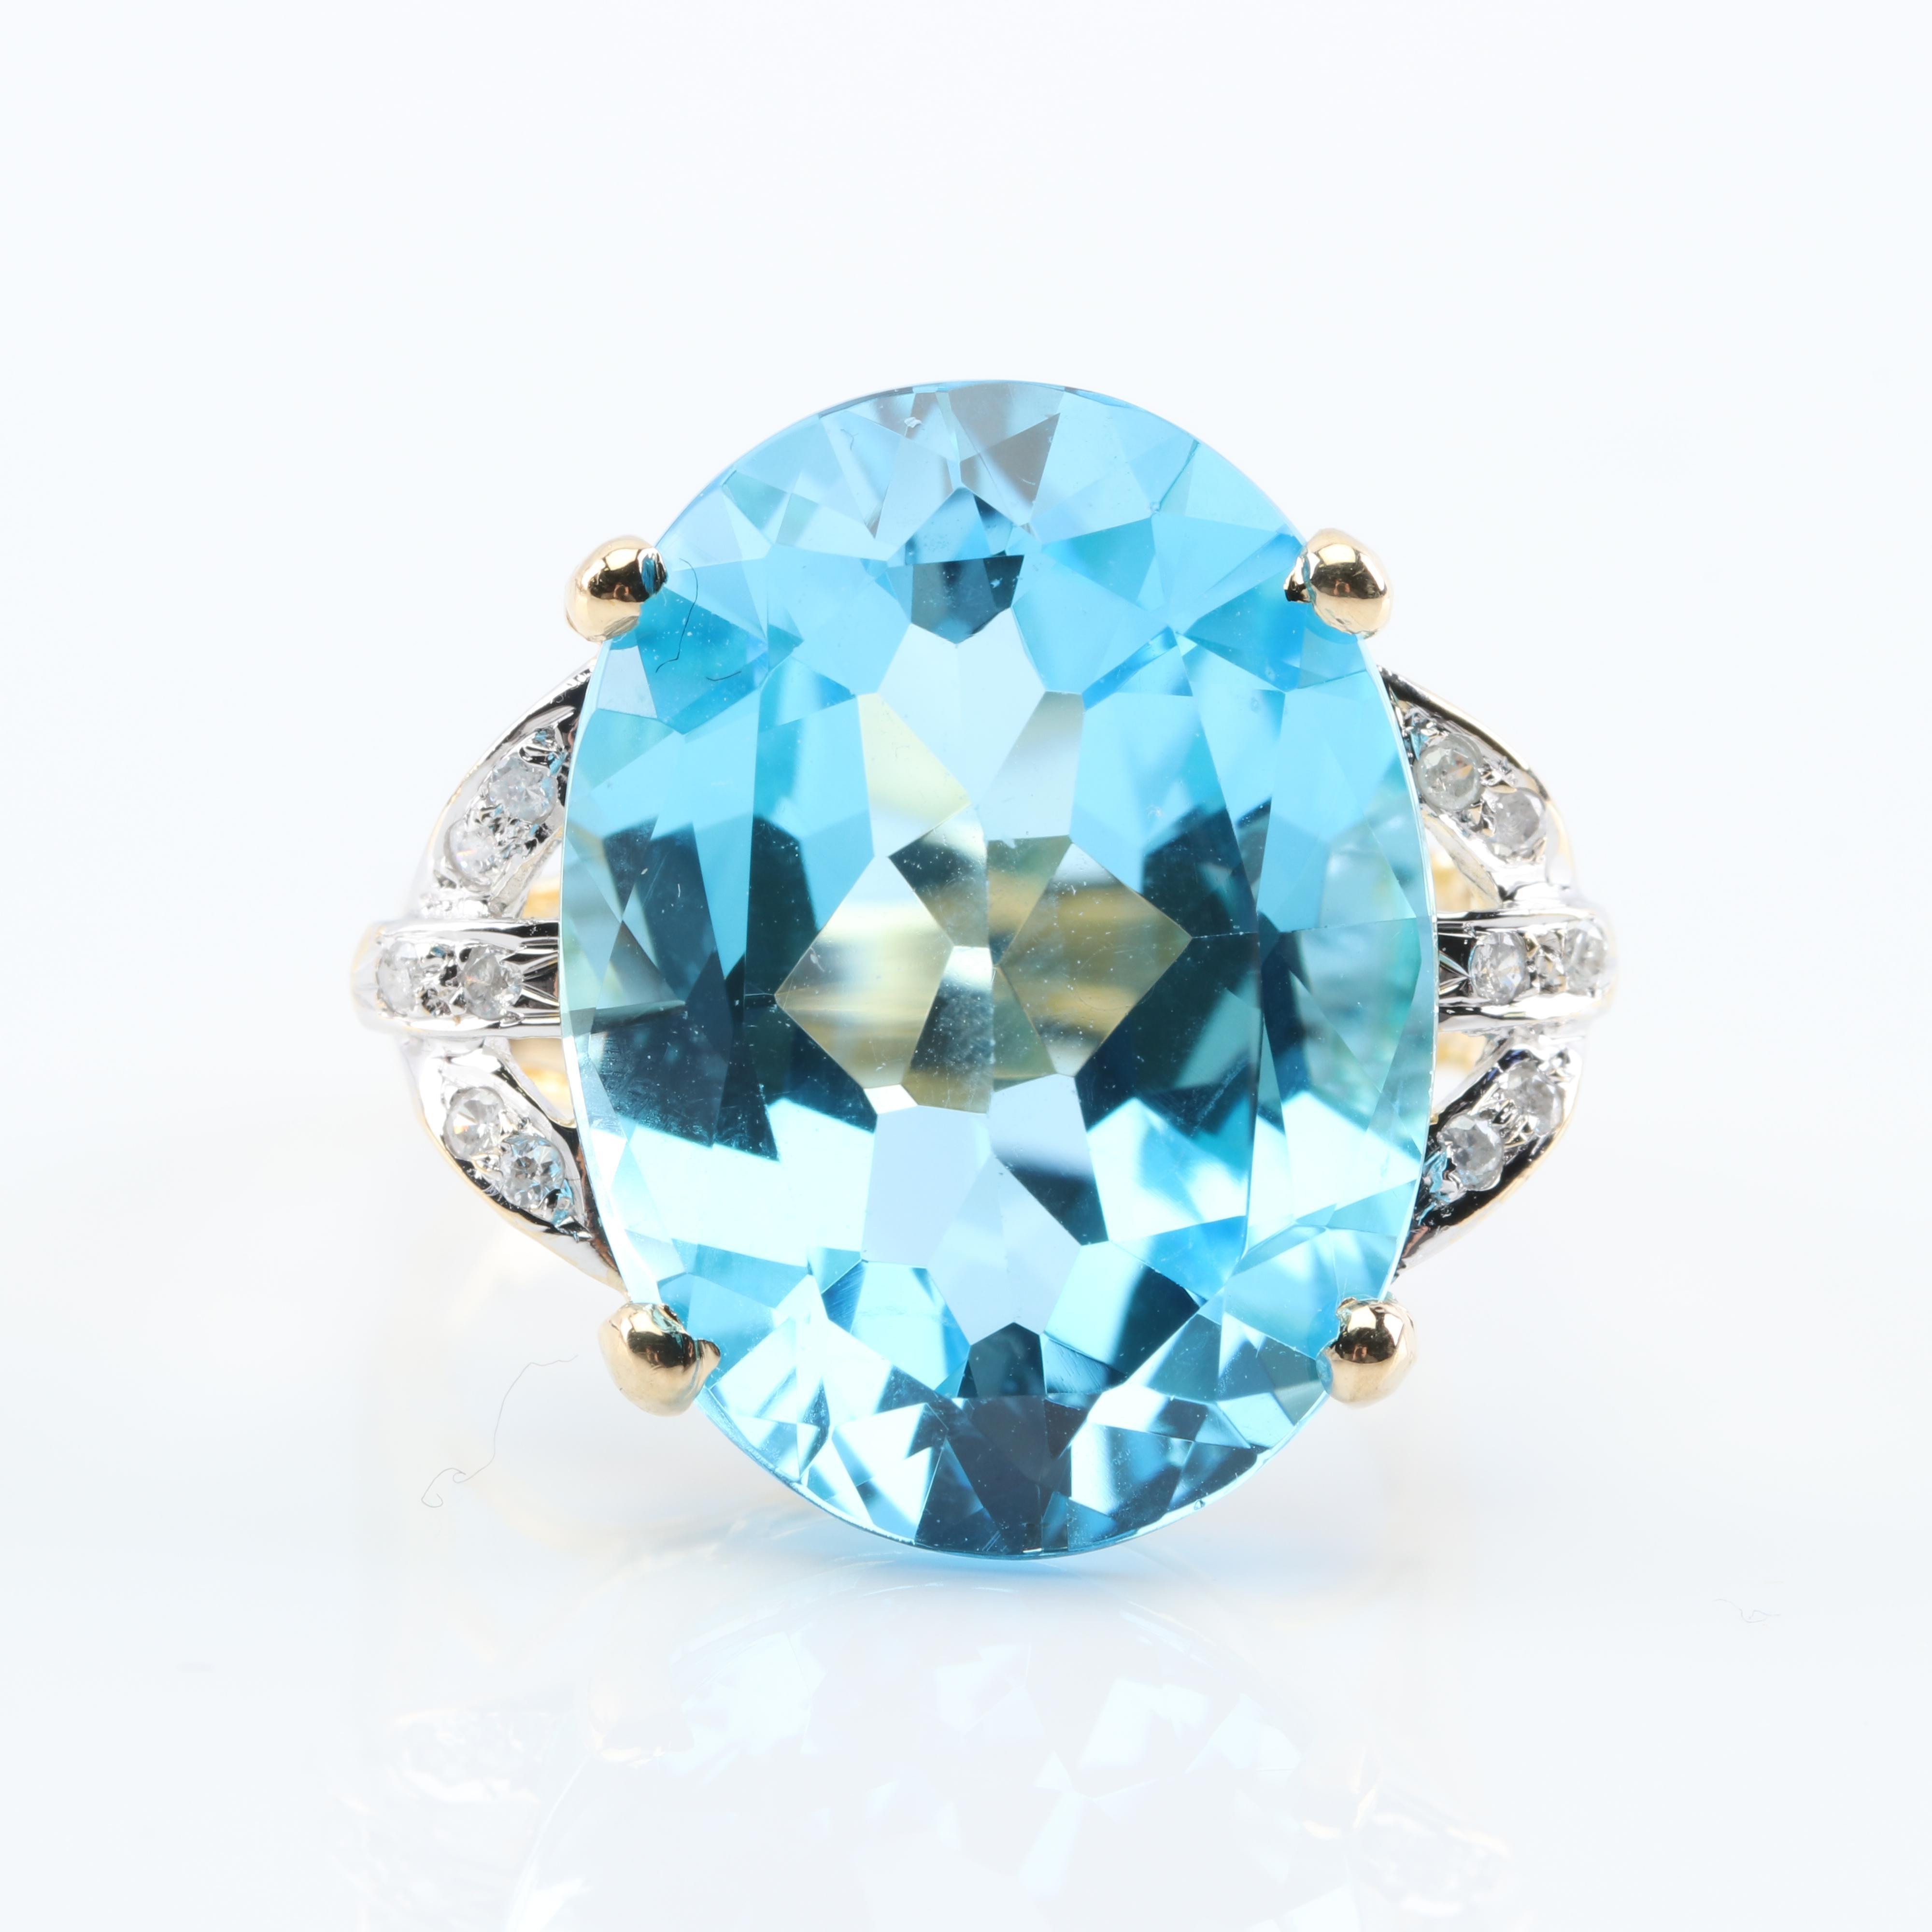 14K Yellow Gold 18.75 Carat Blue Topaz and Diamond Ring